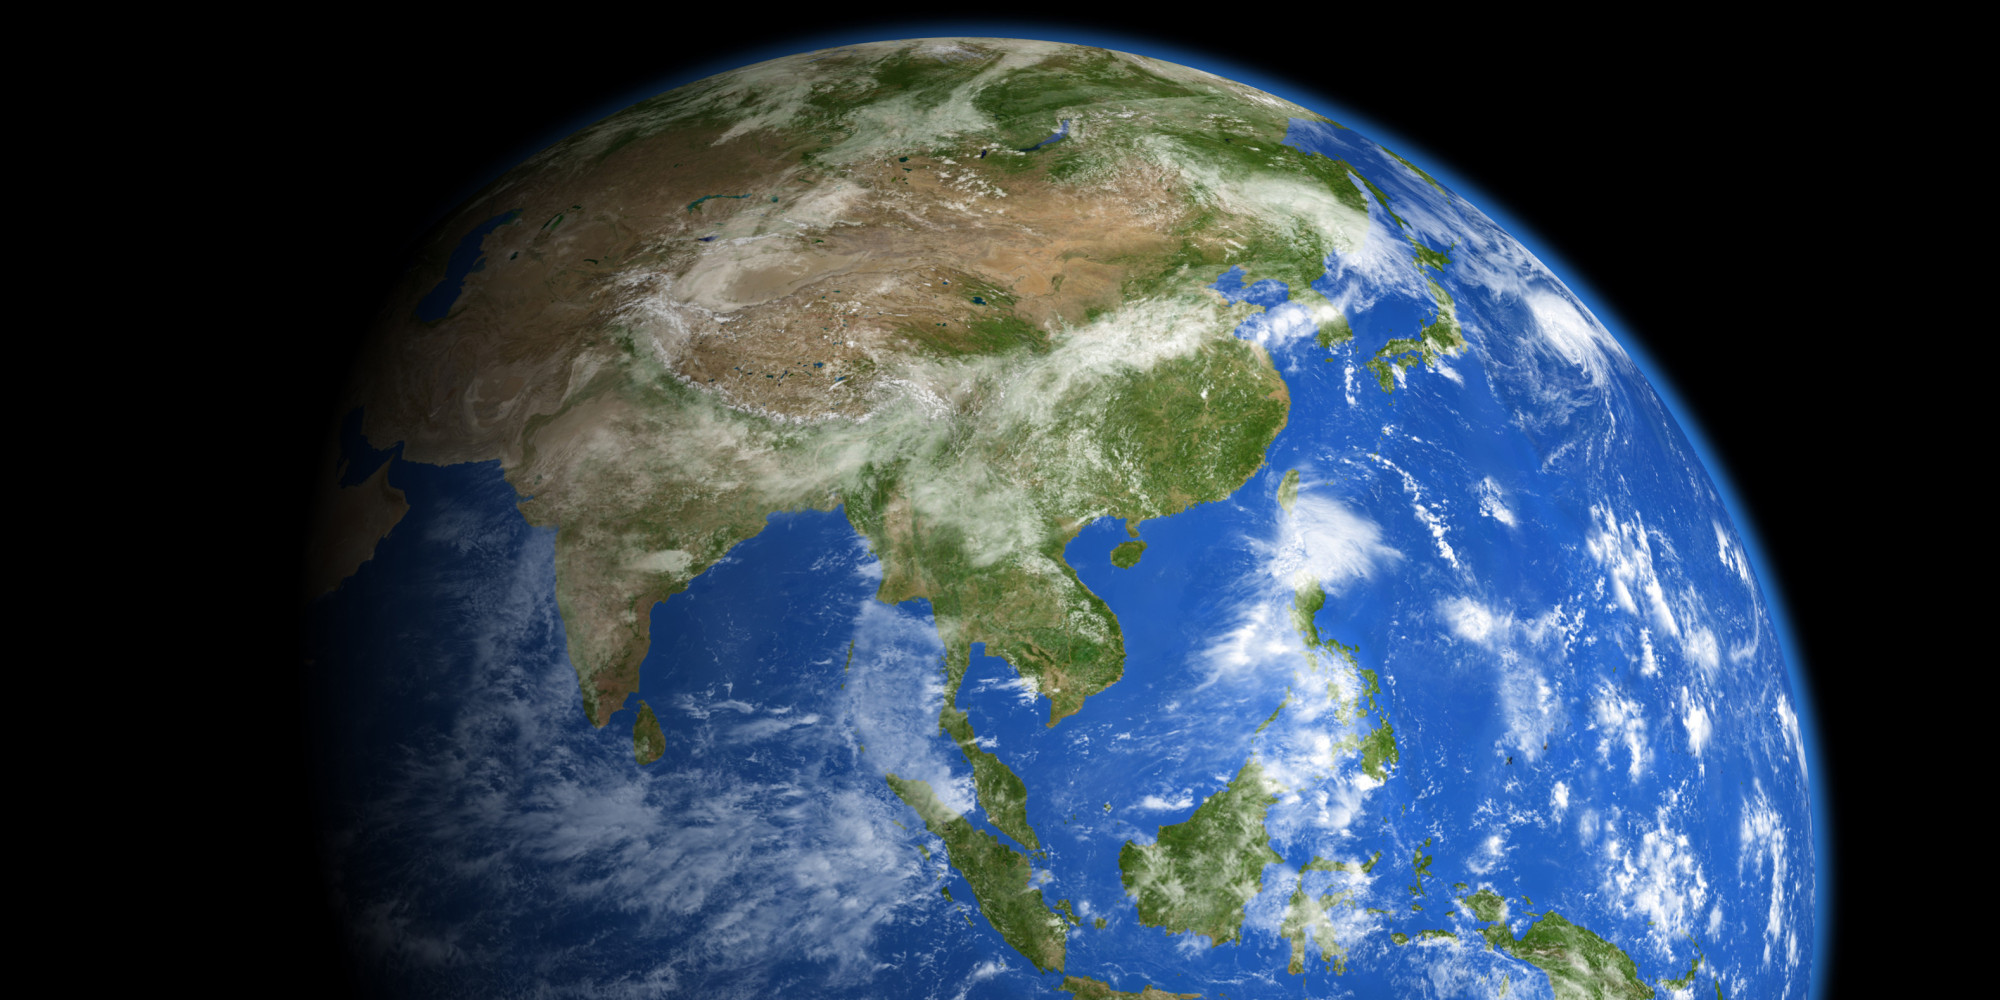 nasa aliens on earth - photo #41